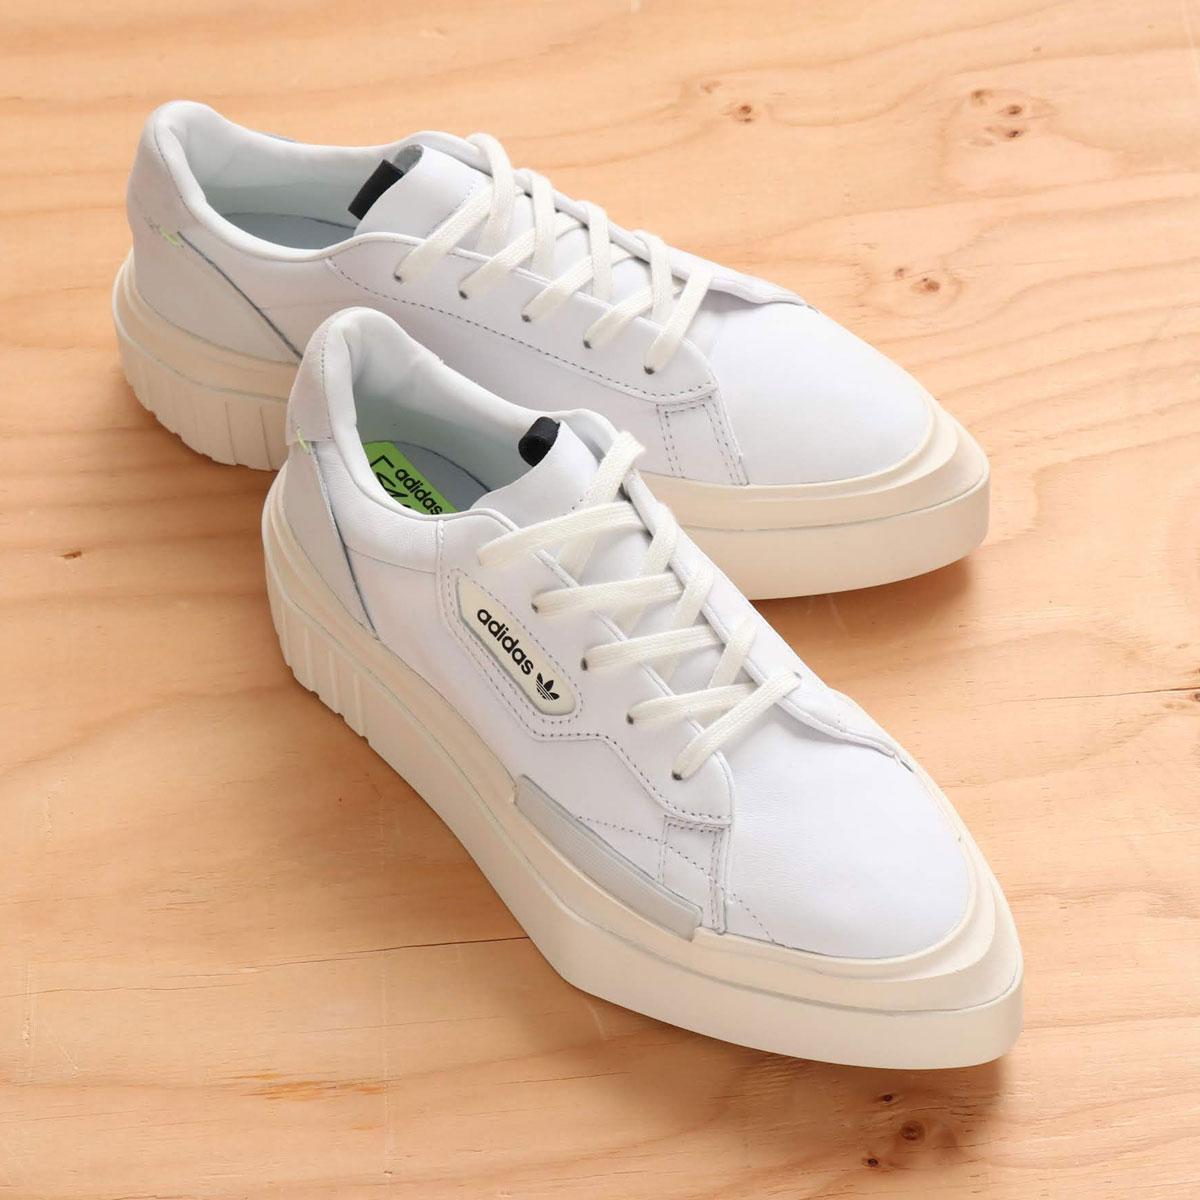 adidas Originals adidas HYPERSLEEK W(アディダスオリジナルス ハイパースリーク W)RUNNING WHITE/OFF WHITE/CRYSTAL WHITE【メンズ レディース スニーカー】19SS-I